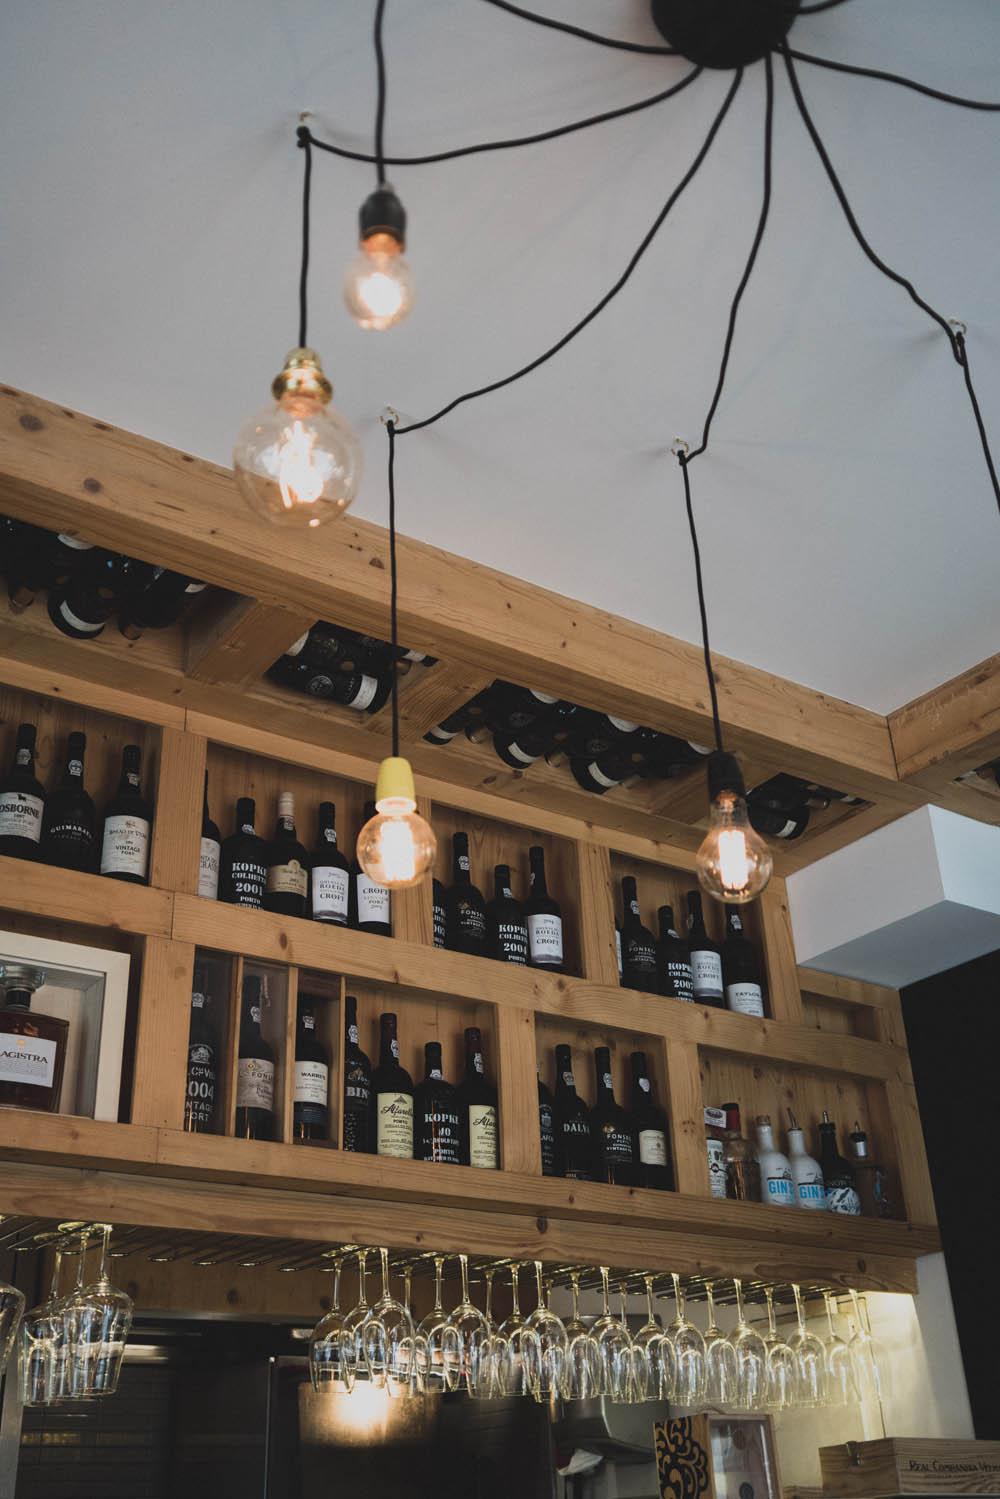 The Wine Cellar